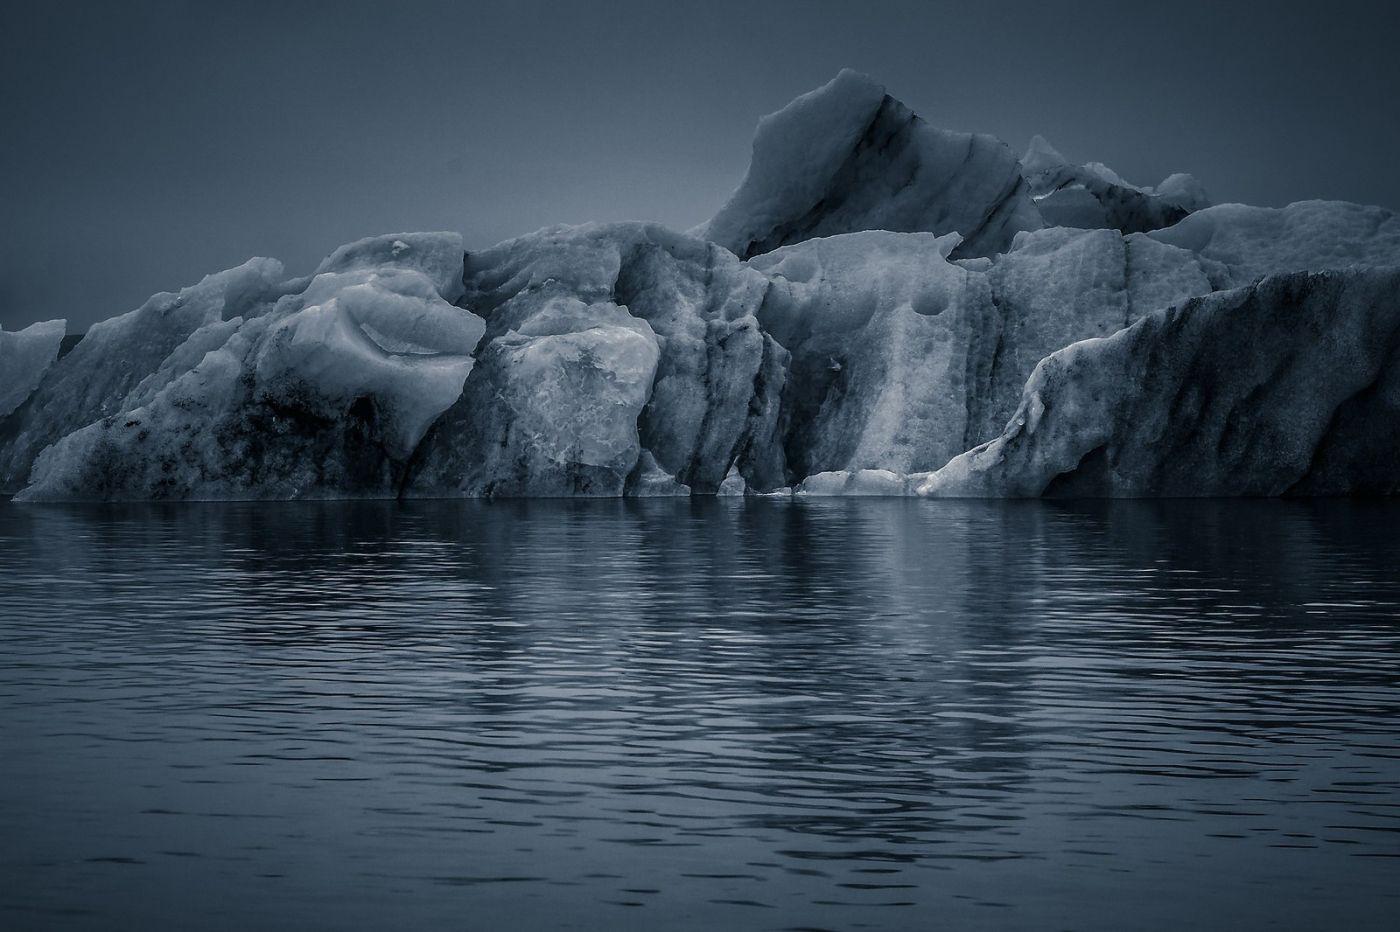 冰岛冰川泻湖(Glacier Lagoon),流动的冰川_图1-27